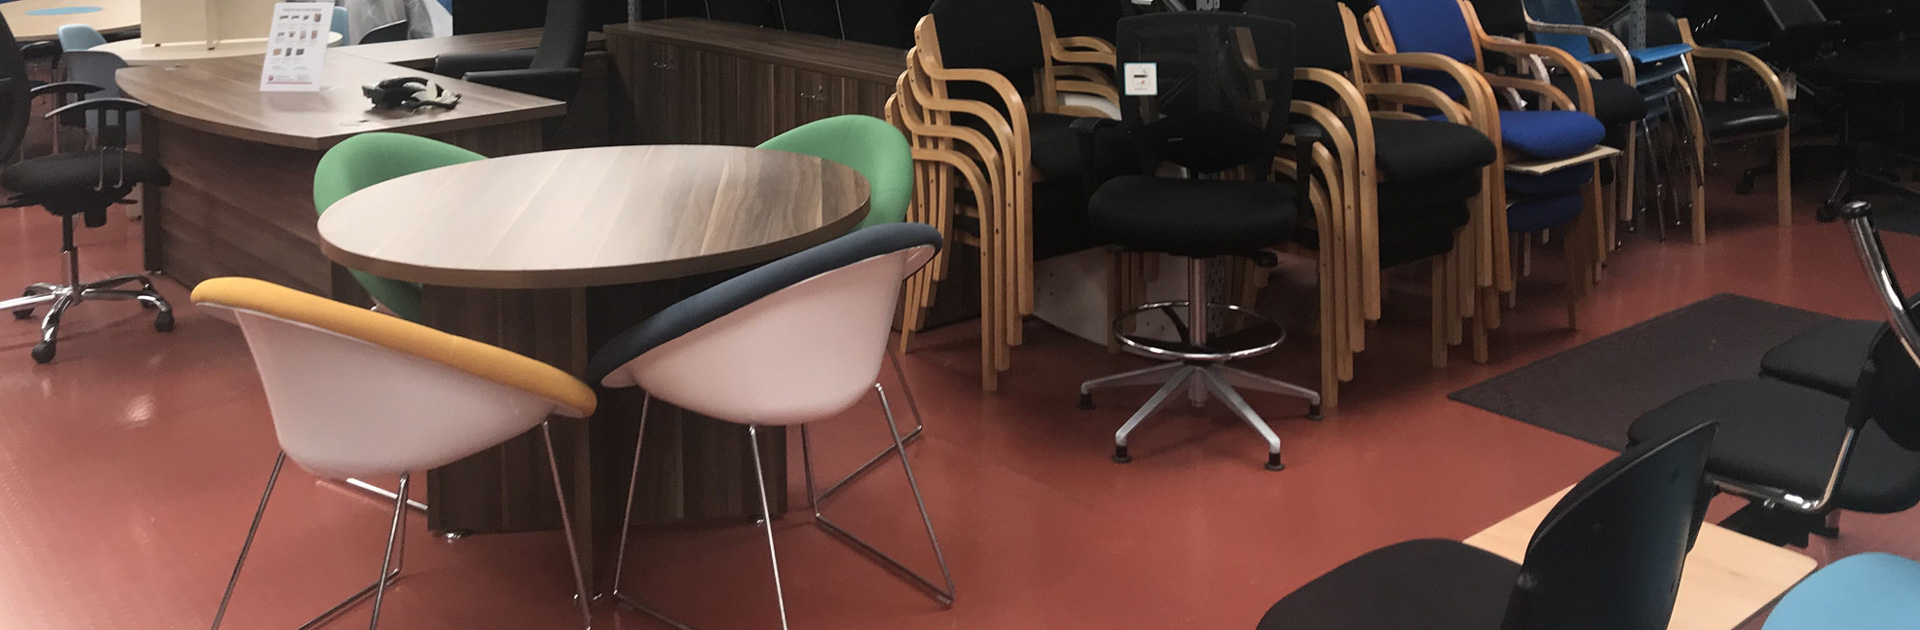 Used Office Furniture London